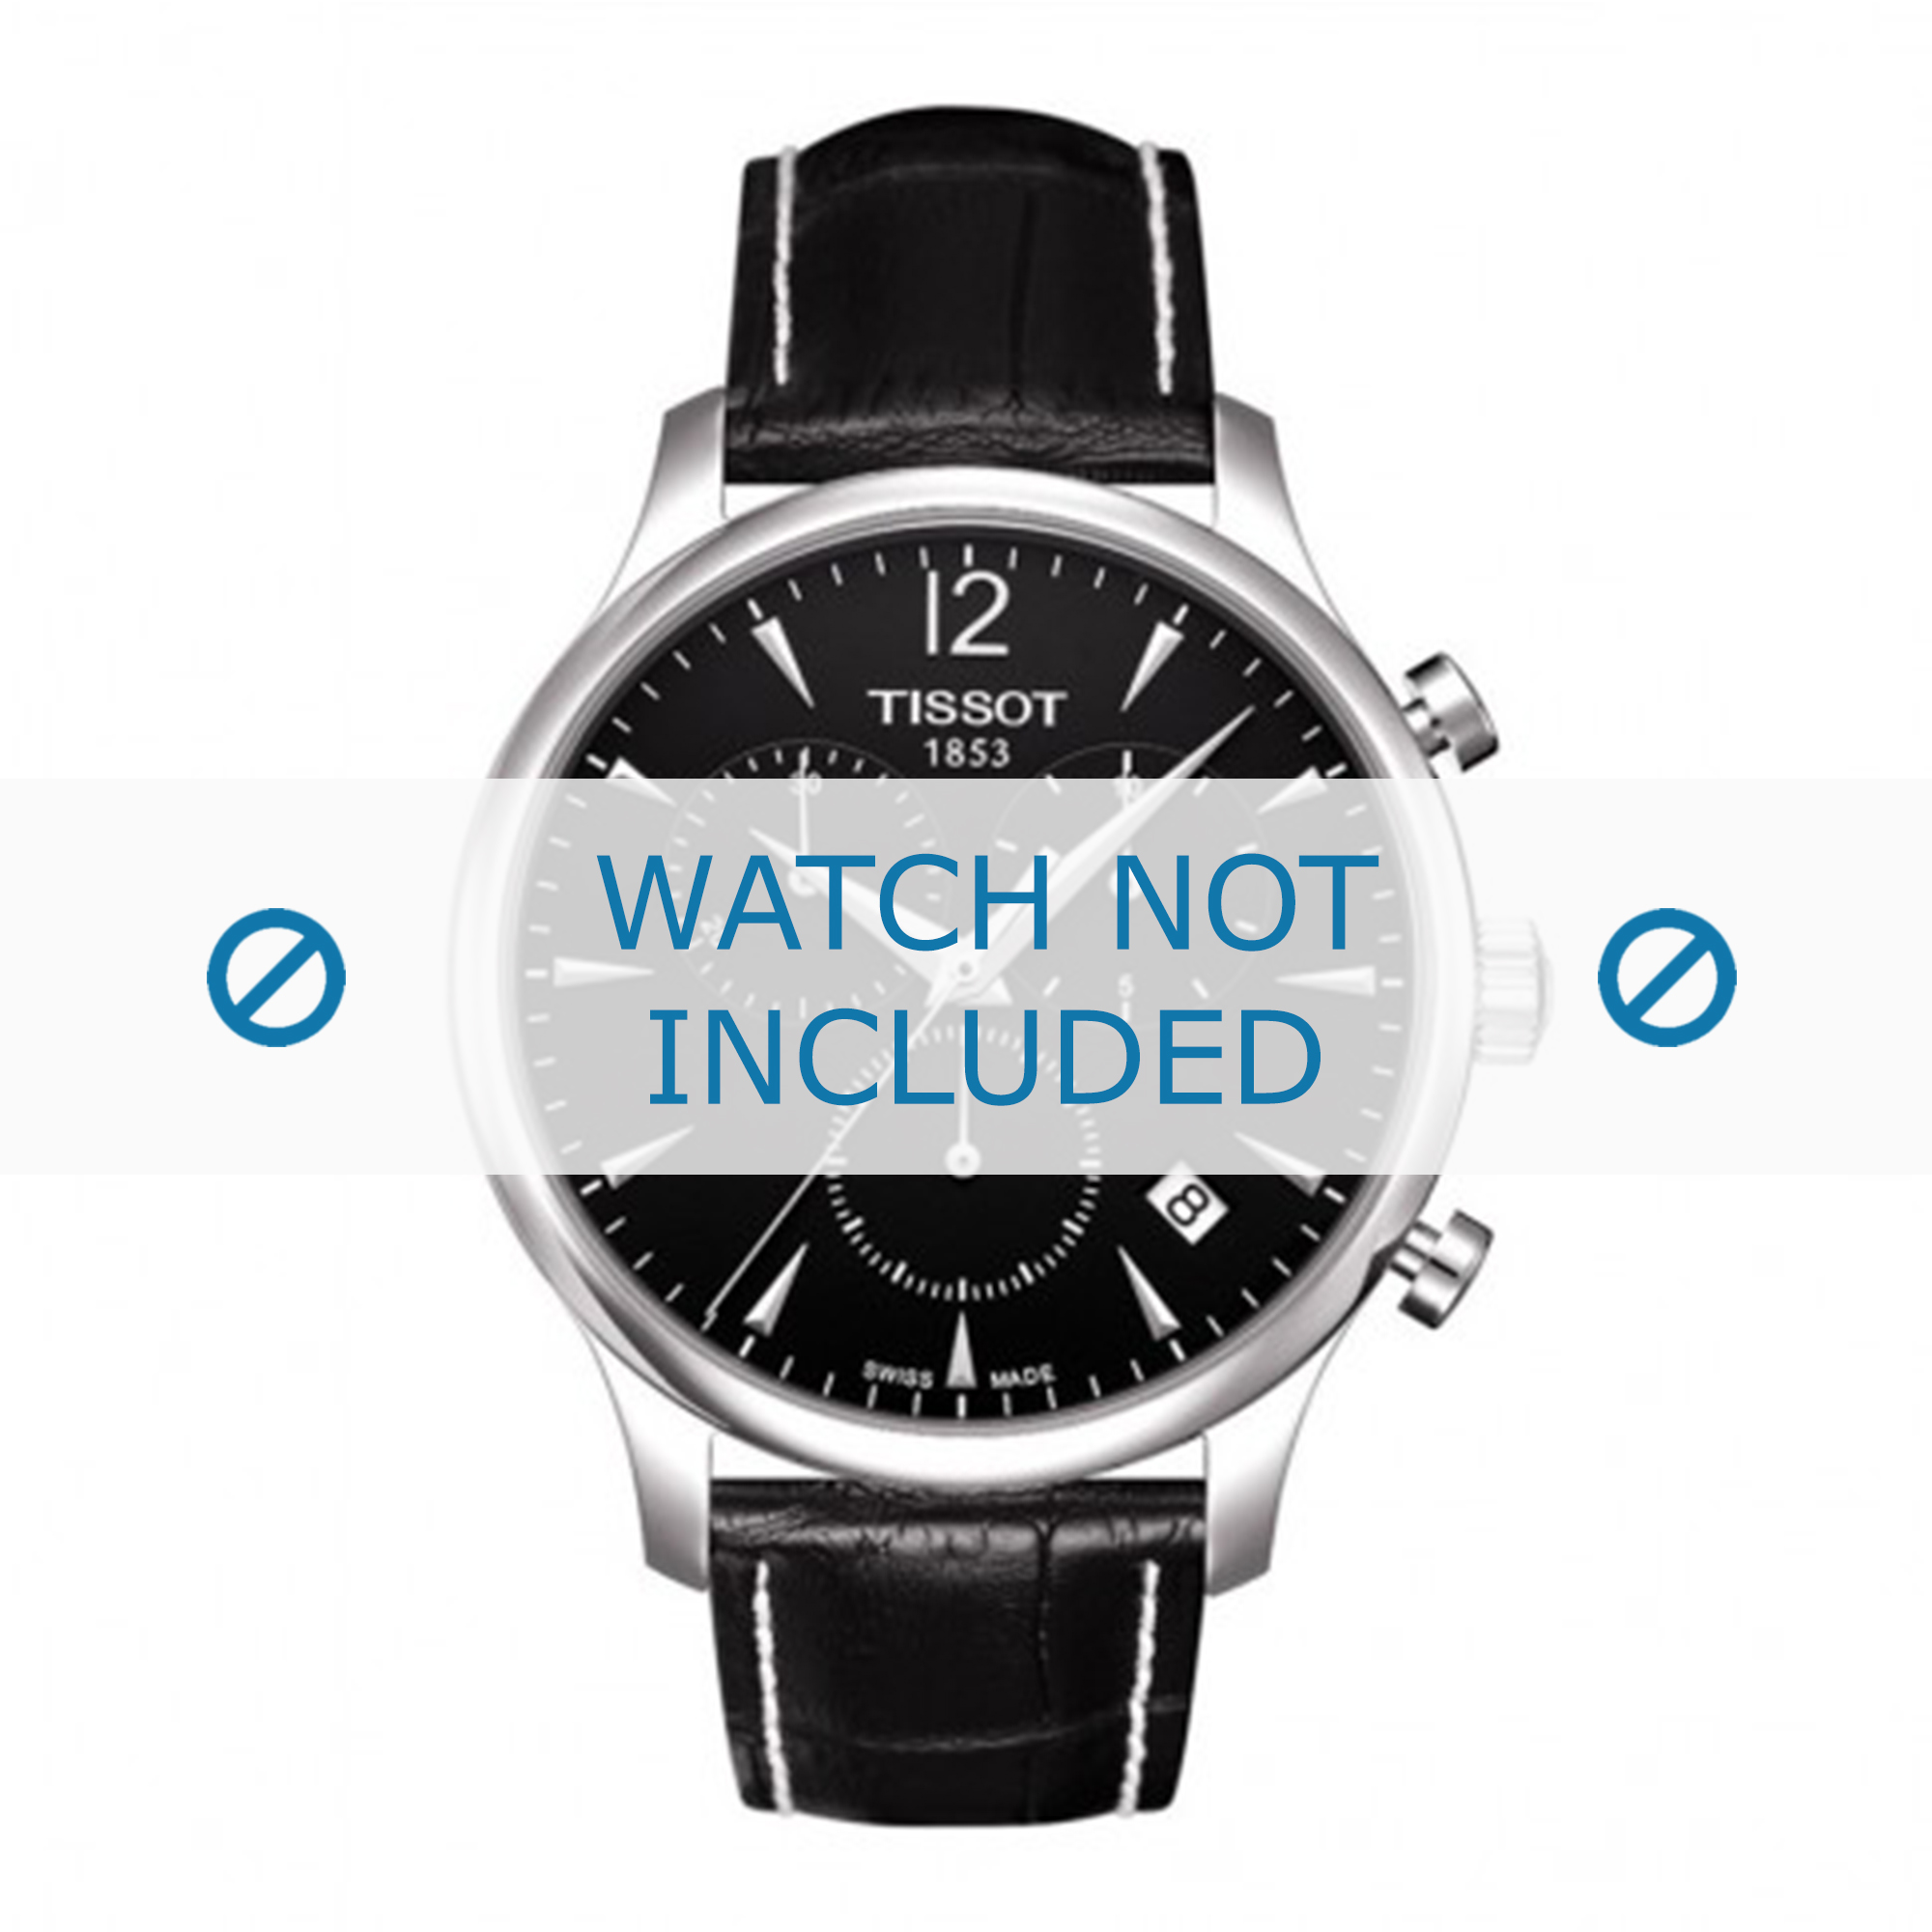 Tissot horlogeband T063.617.16.057.00 Leder Zwart 20mm + wit stiksel